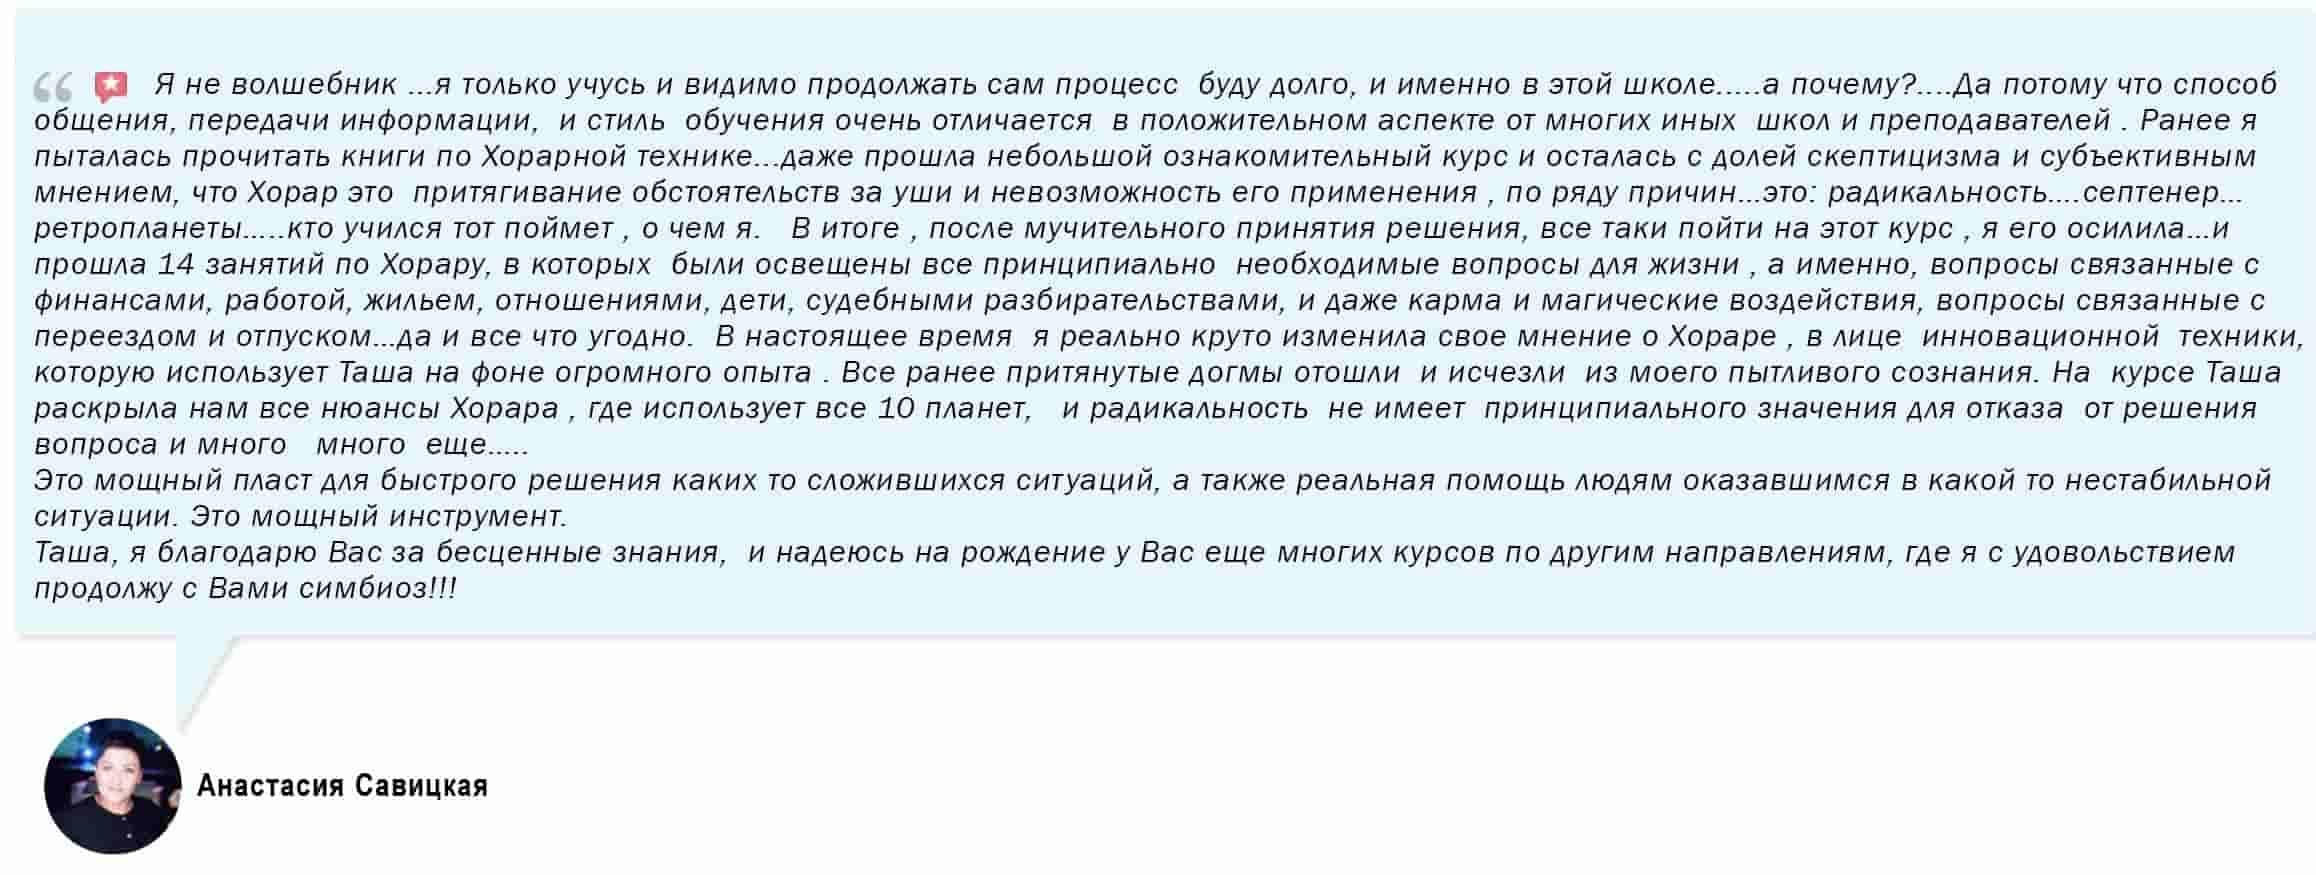 https://astrologtasha.ru/wp-content/uploads/2021/07/отзыв-Савитцкая.jpg